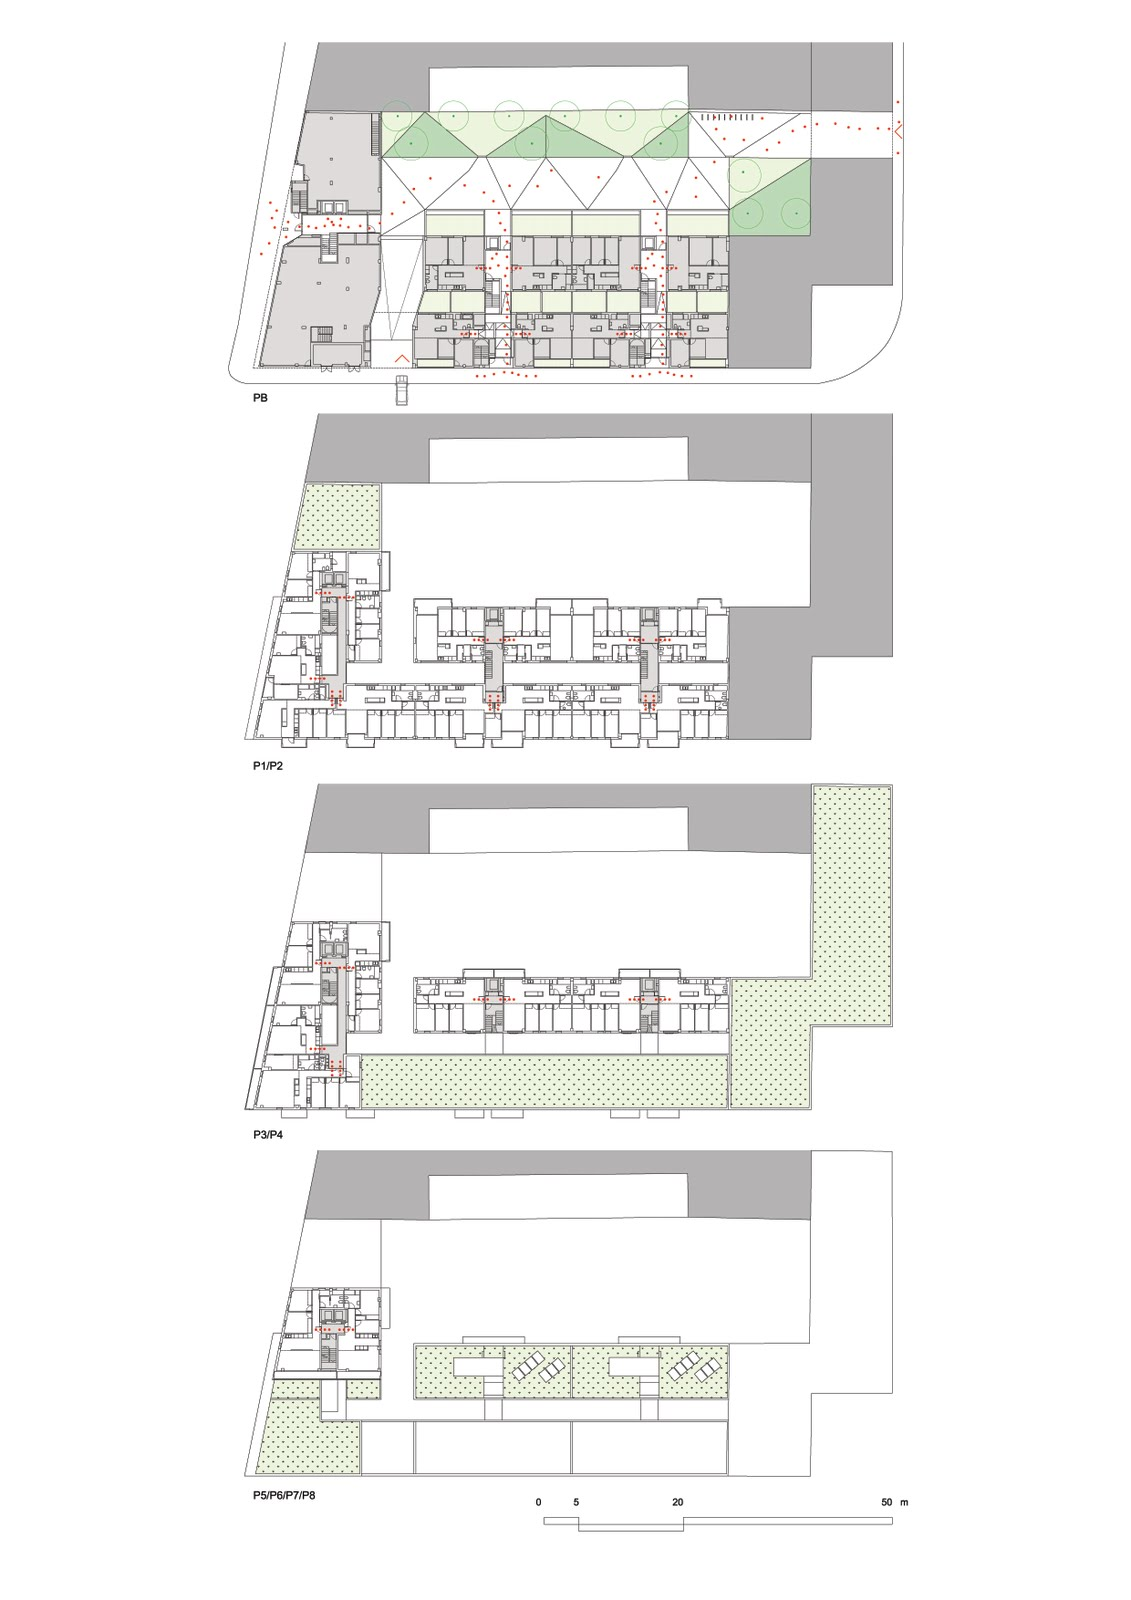 Flexo arquitectura vpo les corts hic arquitectura - Flexo arquitectura ...